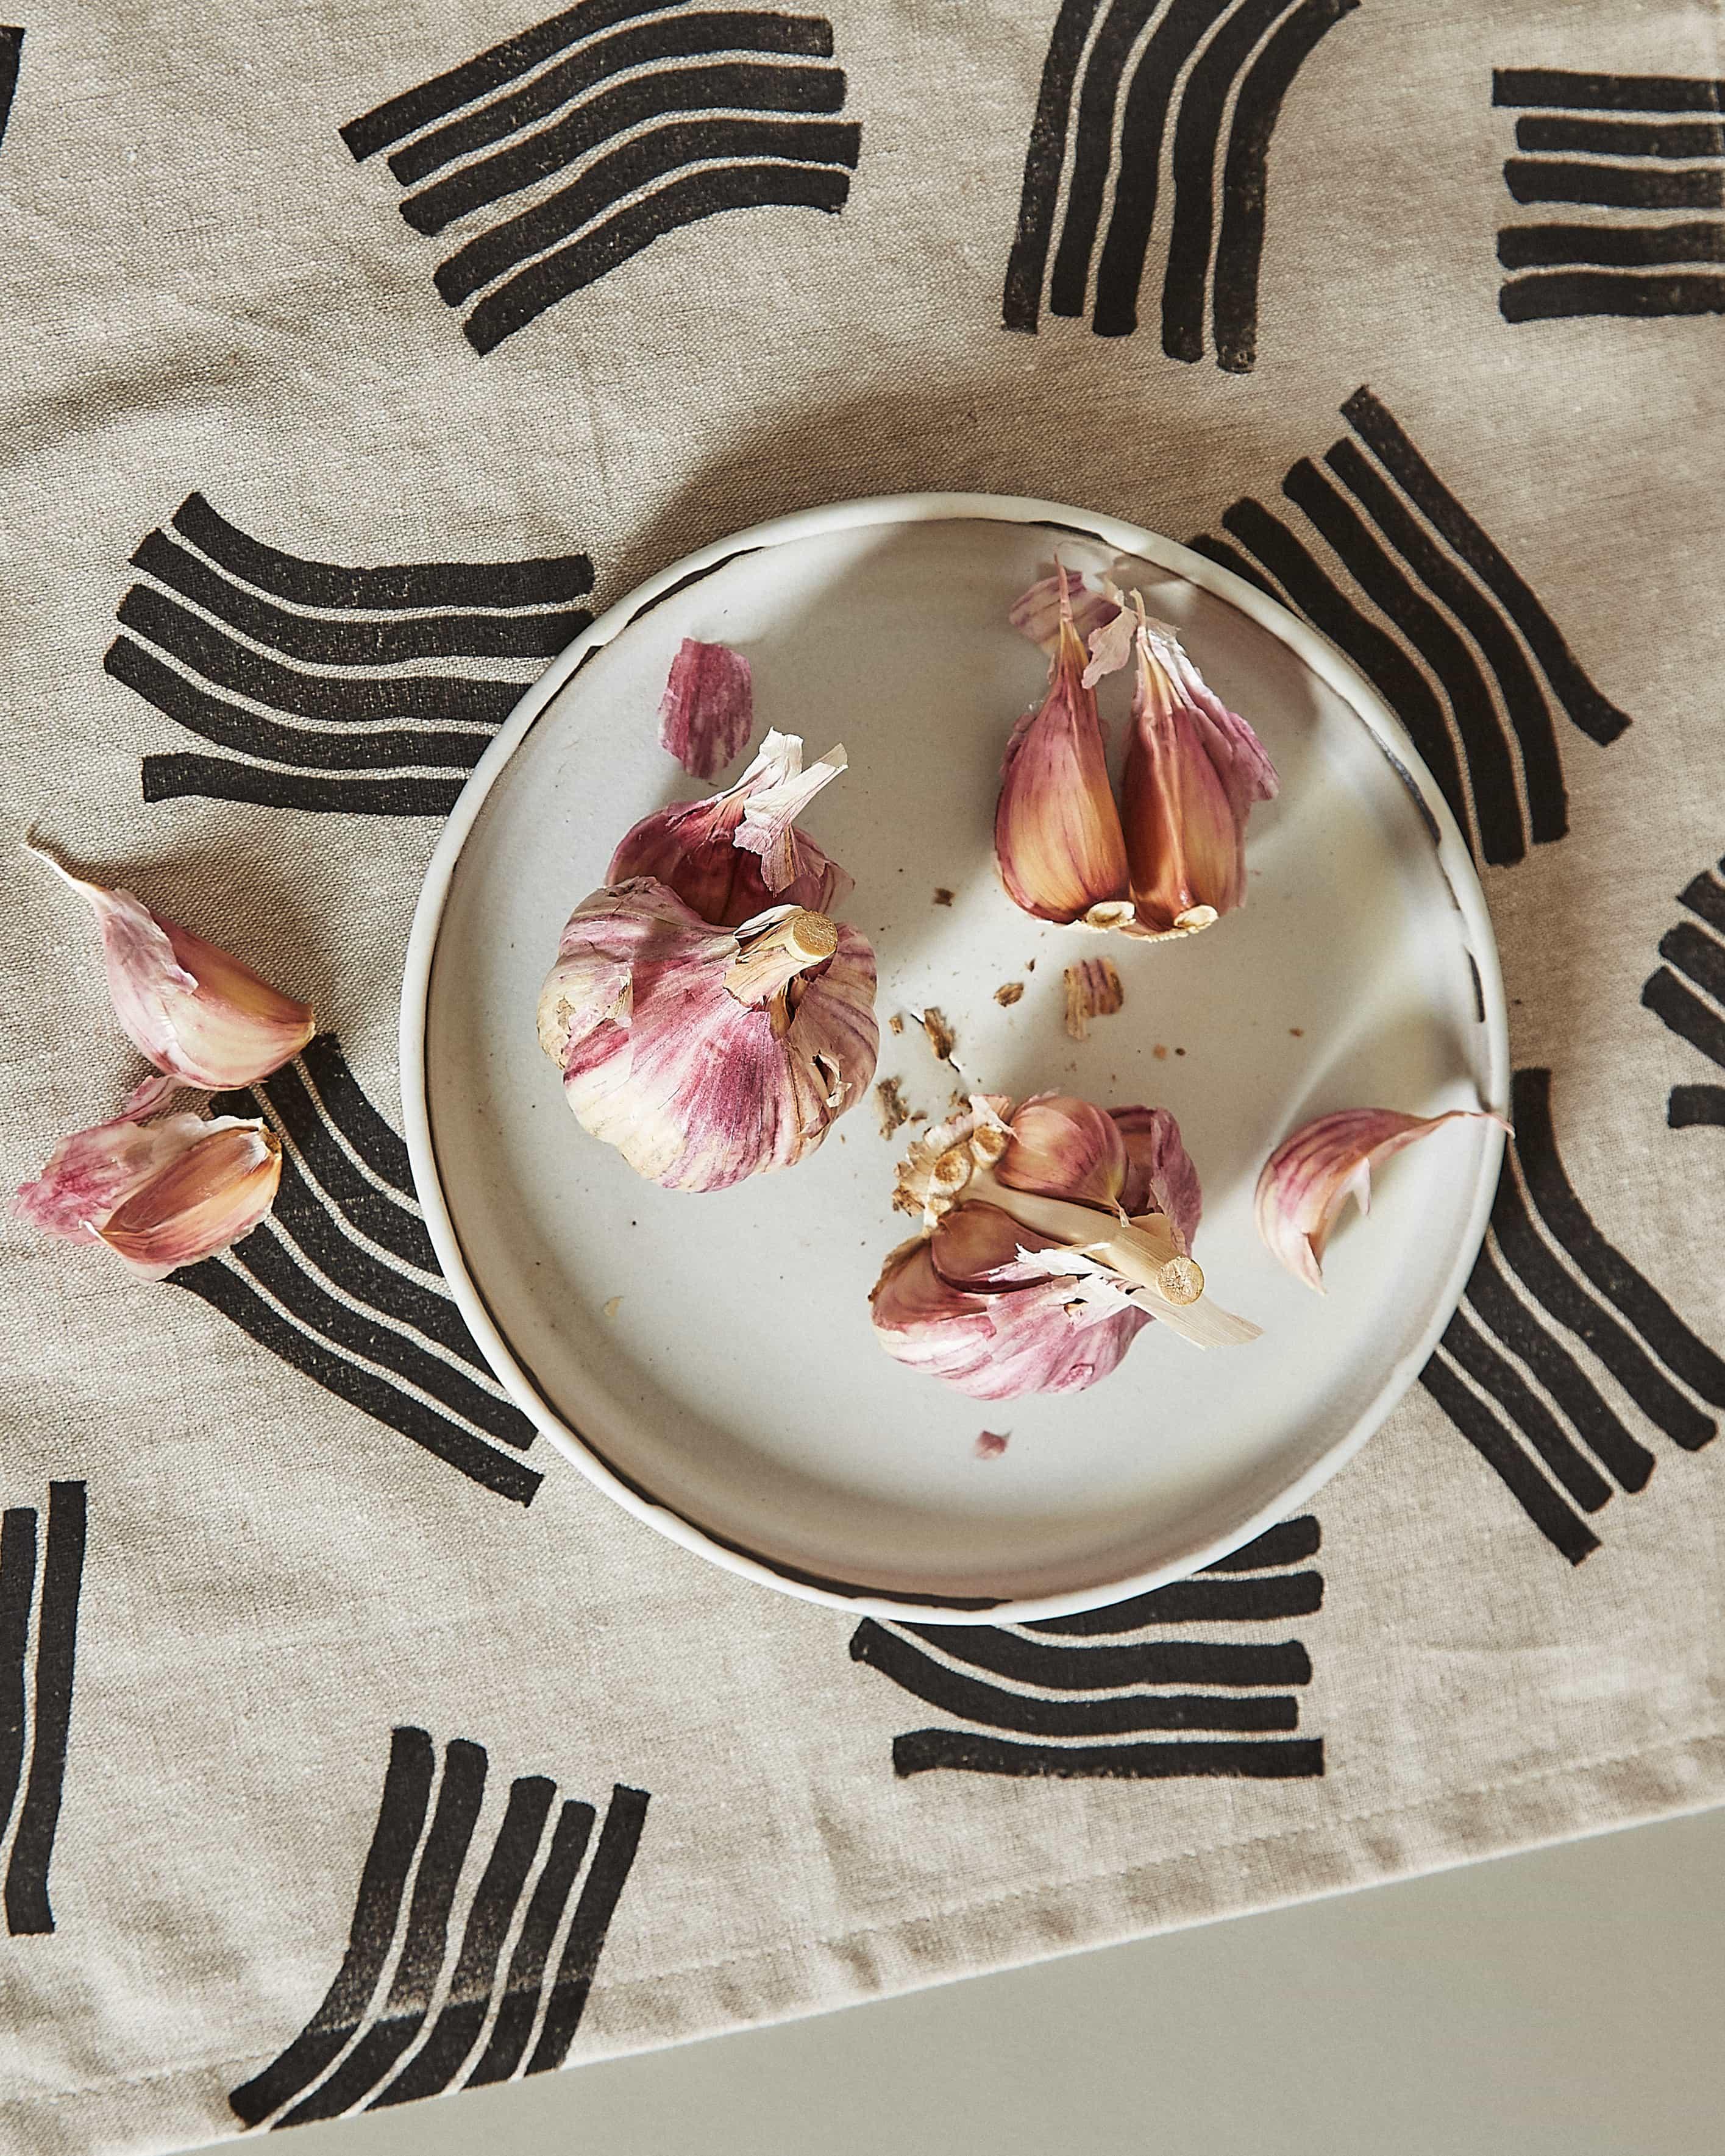 wave napkin with garlic